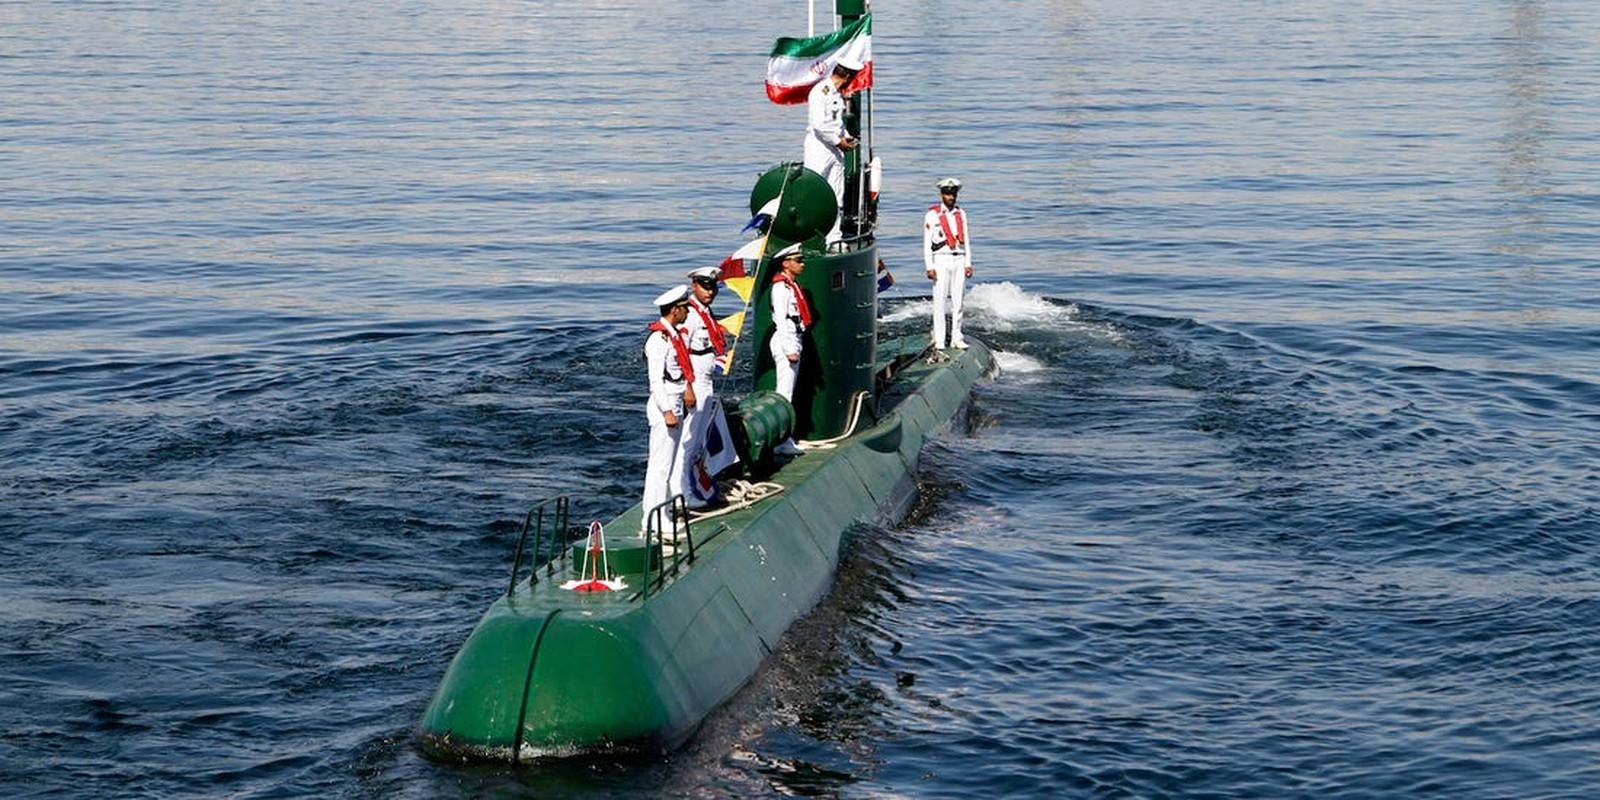 Nhung tau ngam khien Hai quan Iran tro thanh moi de doa nghiem trong-Hinh-10